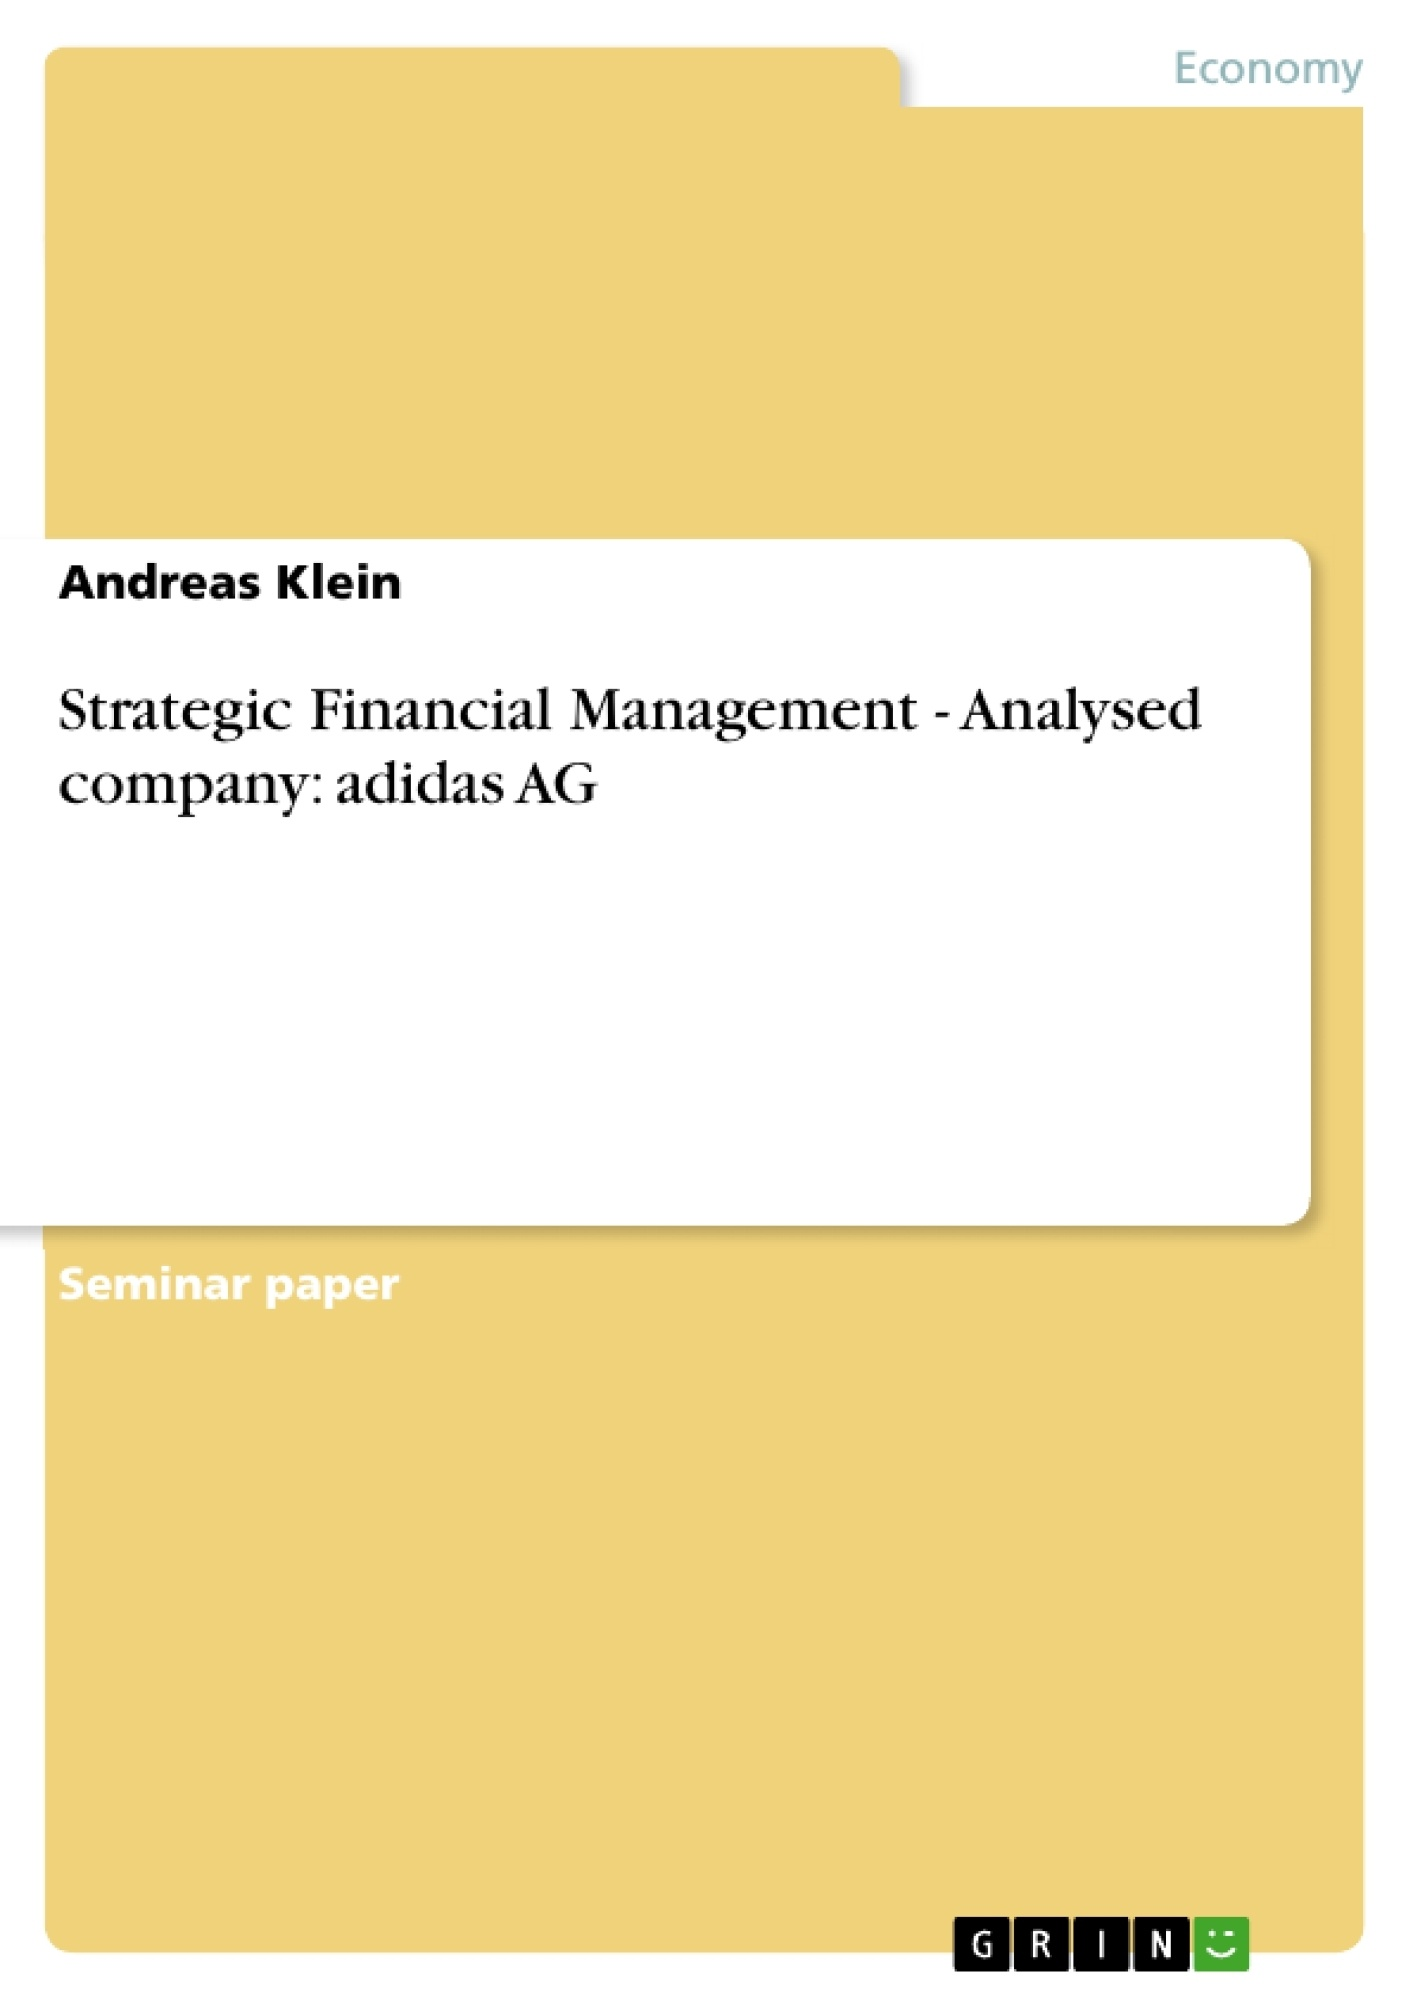 Strategic Financial Management - Analysed company: adidas AG